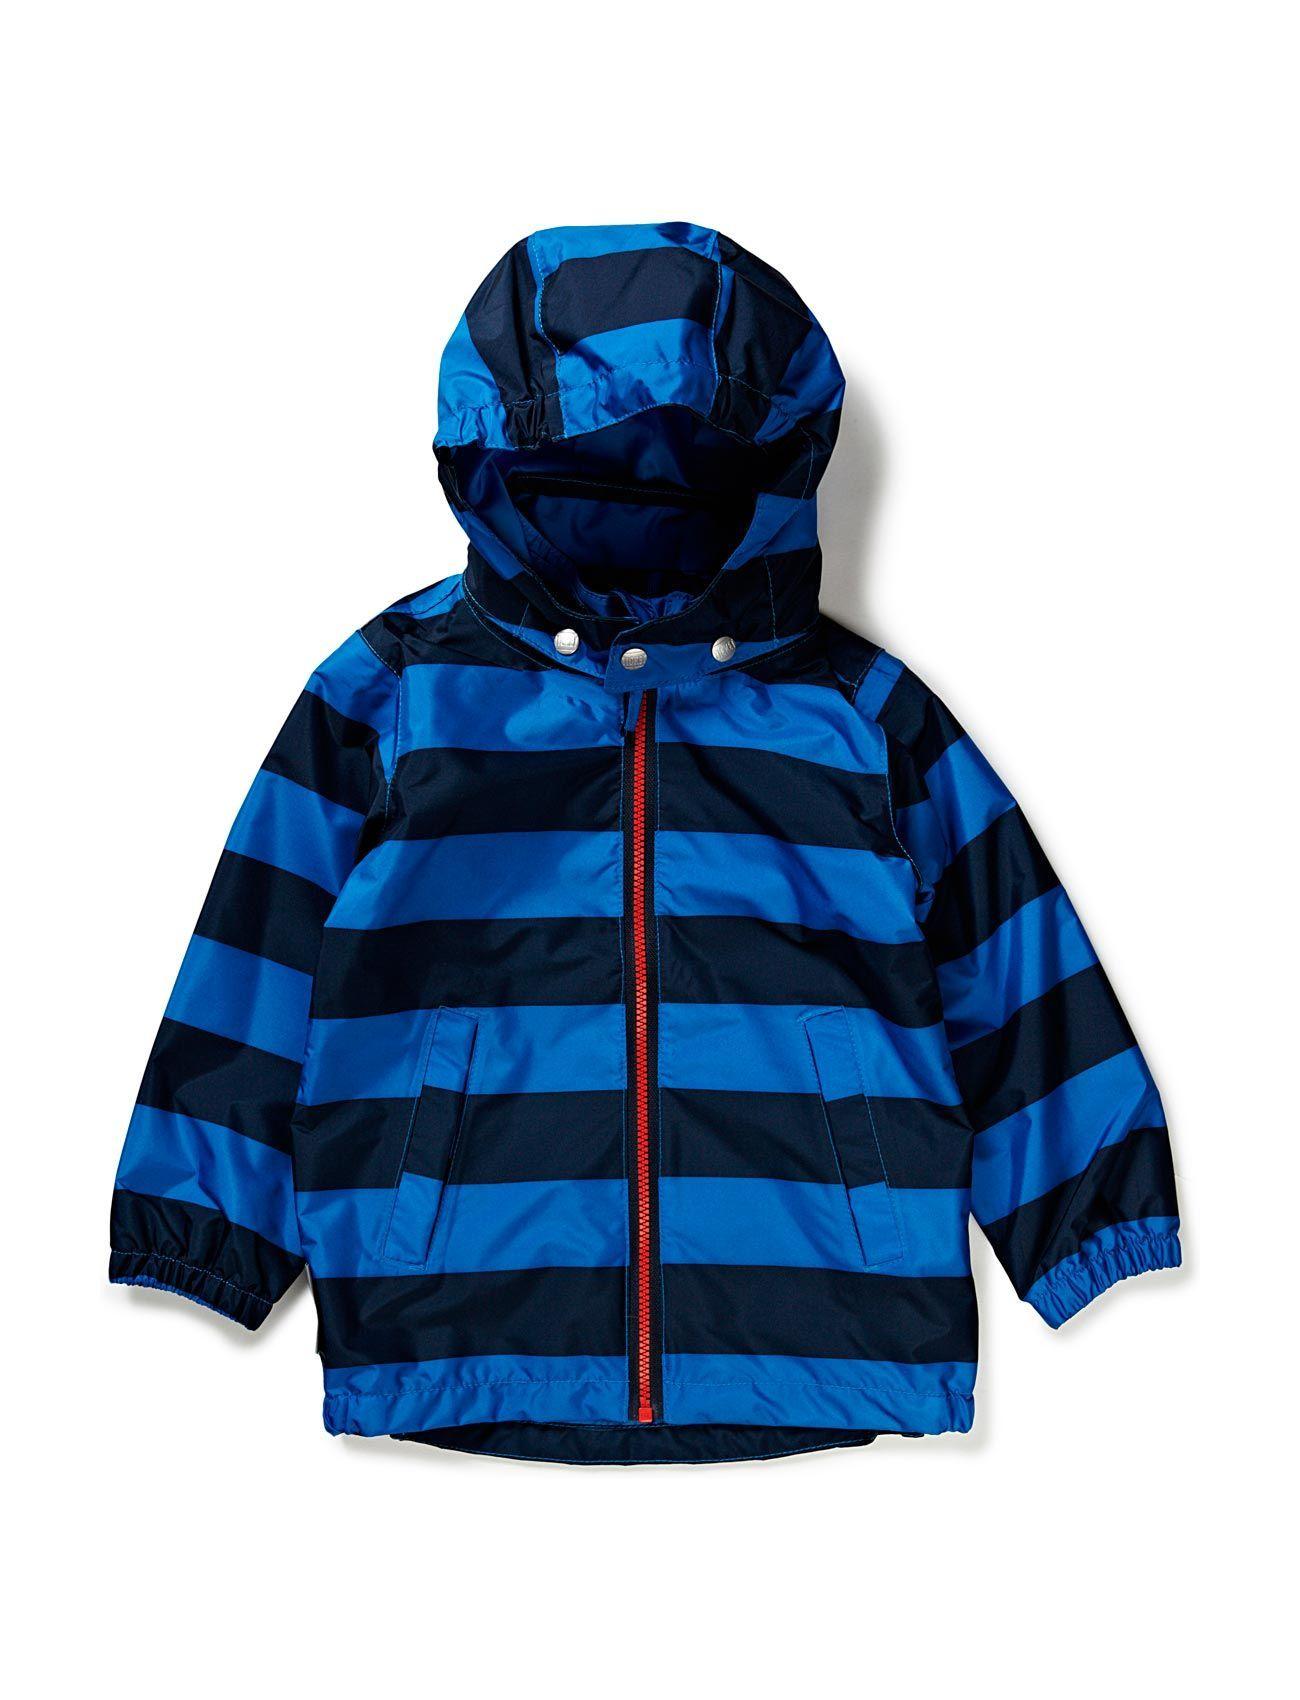 Niss Baby Jacket